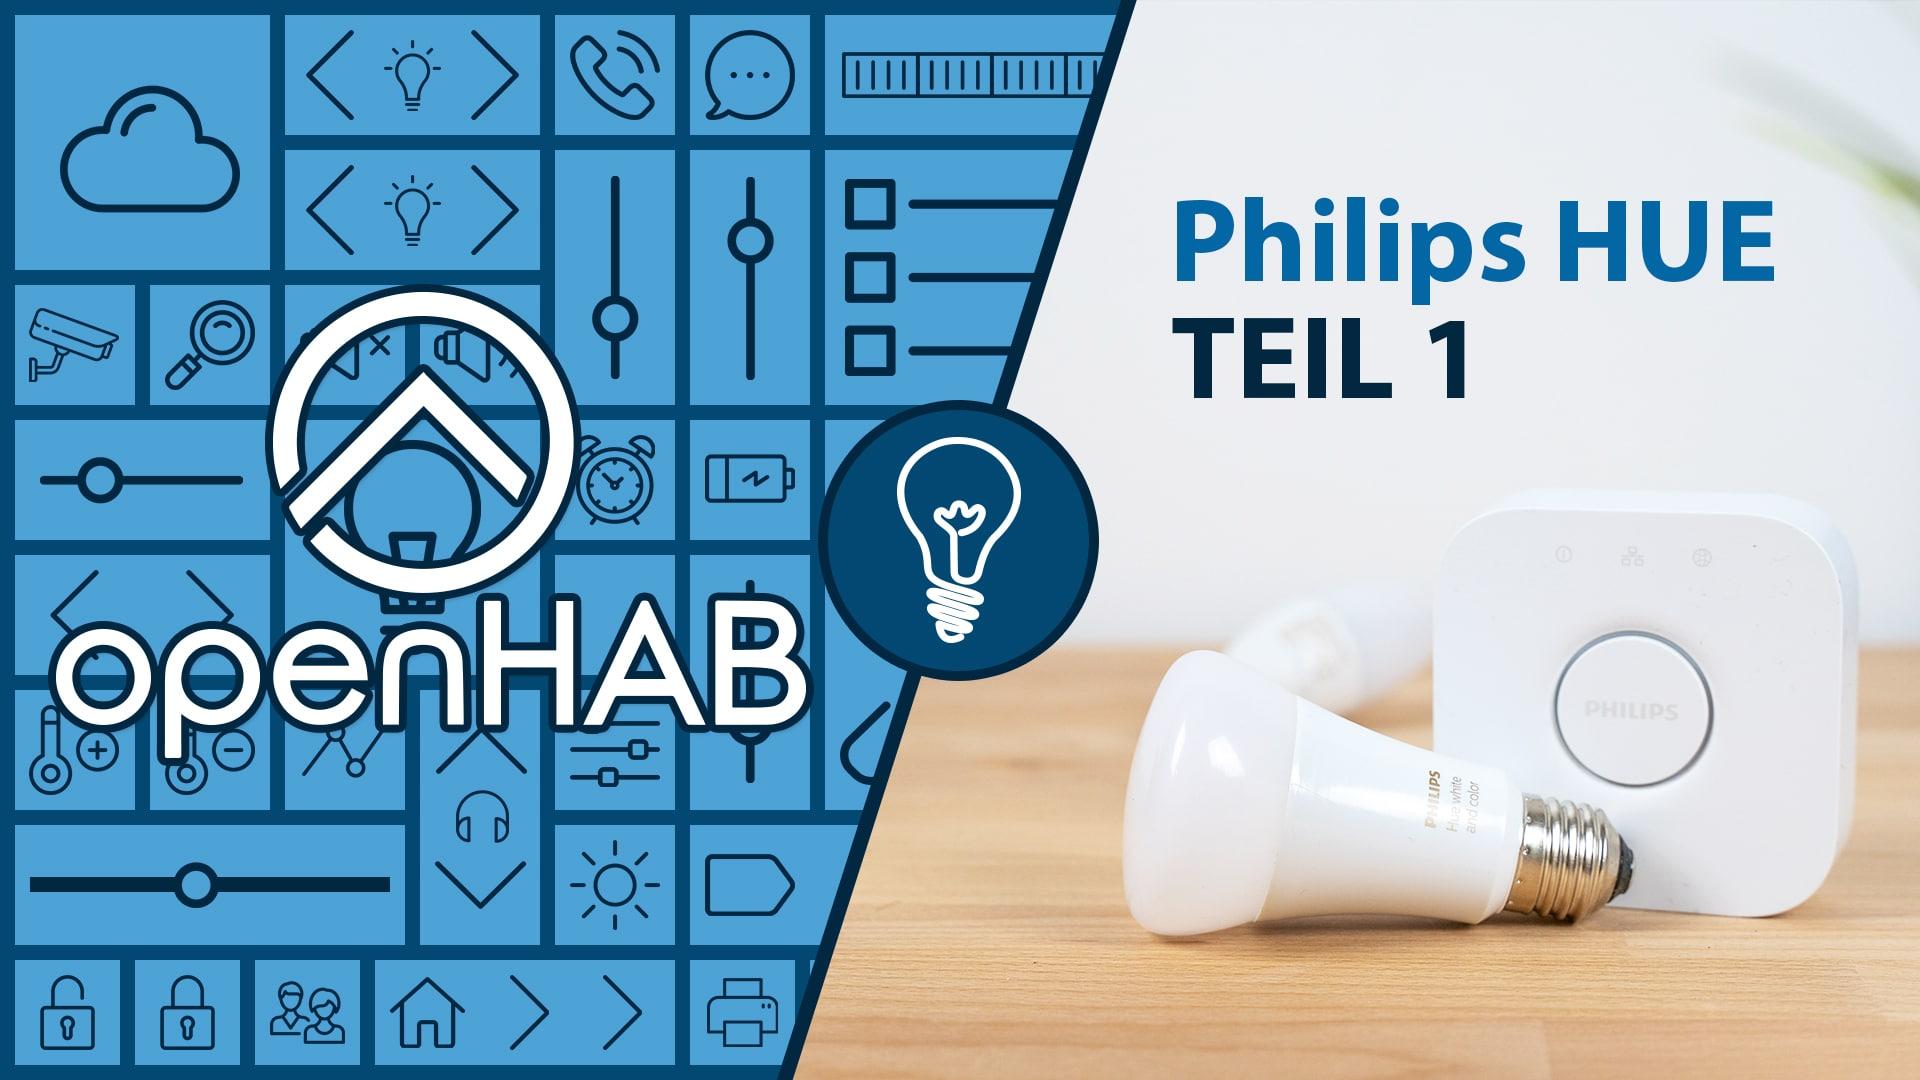 openHAB 2 Philips HUE